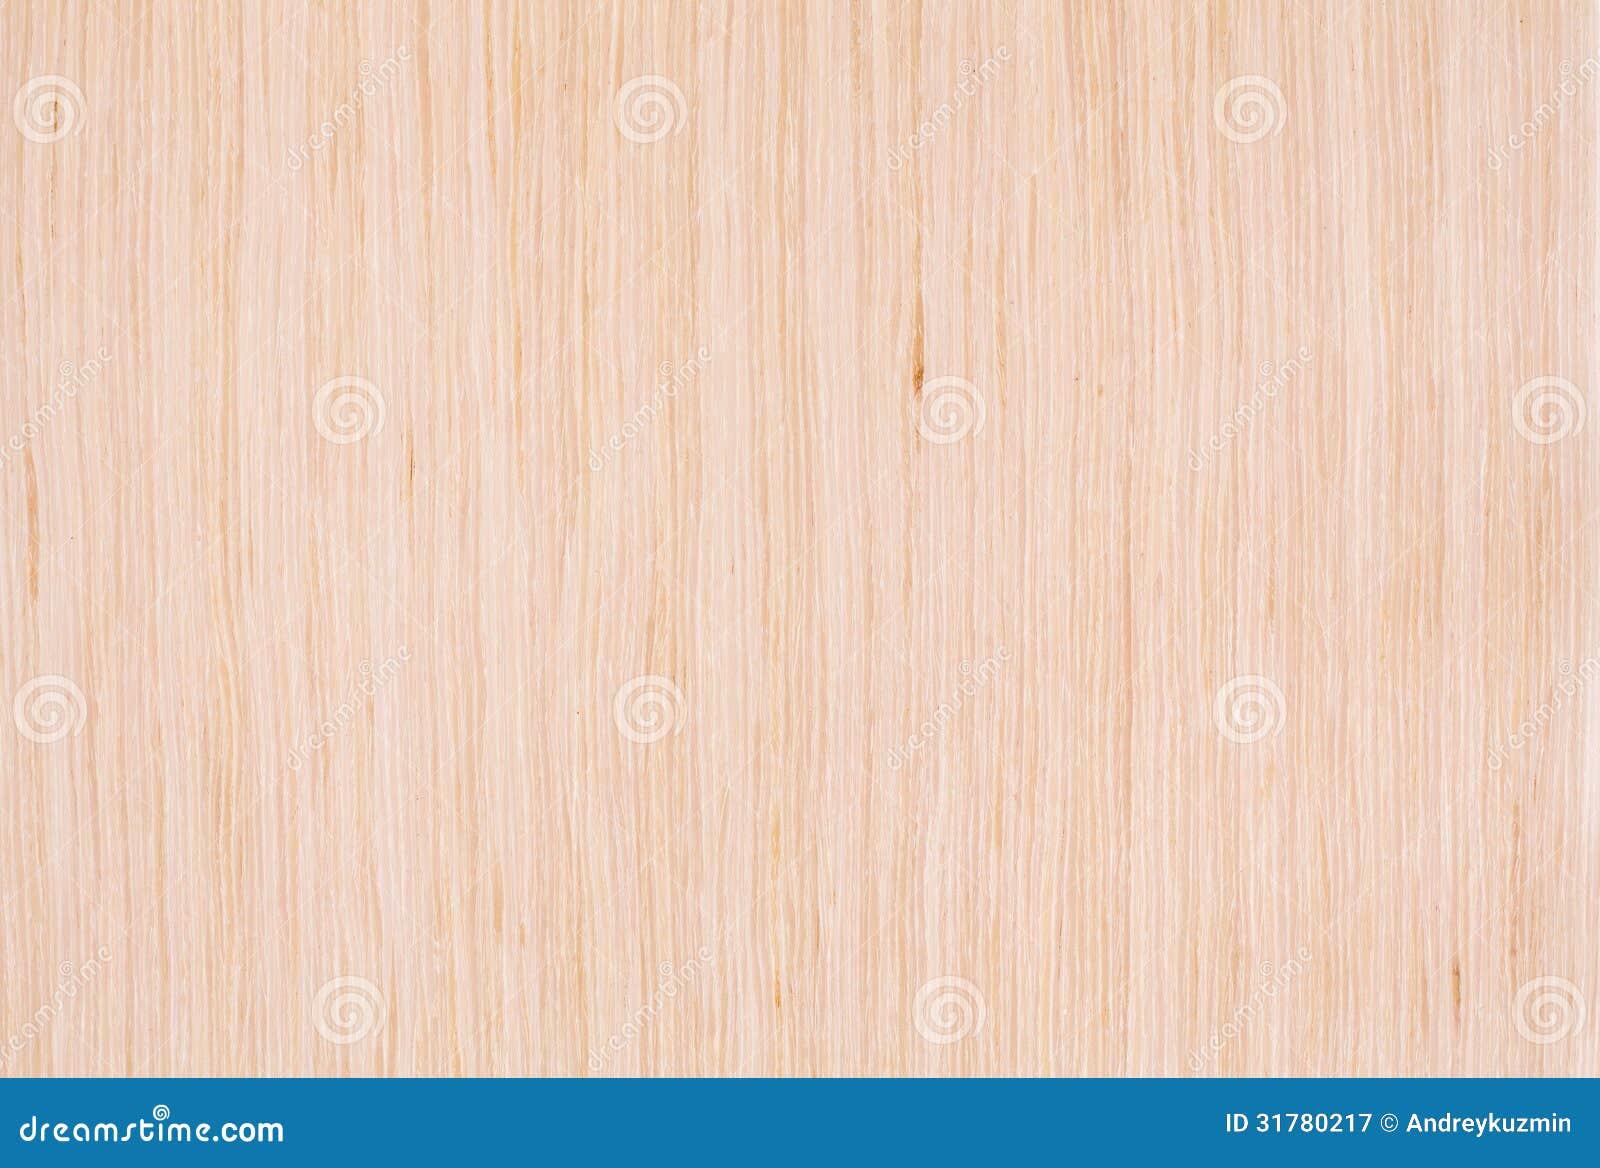 Bleached oak wood texture